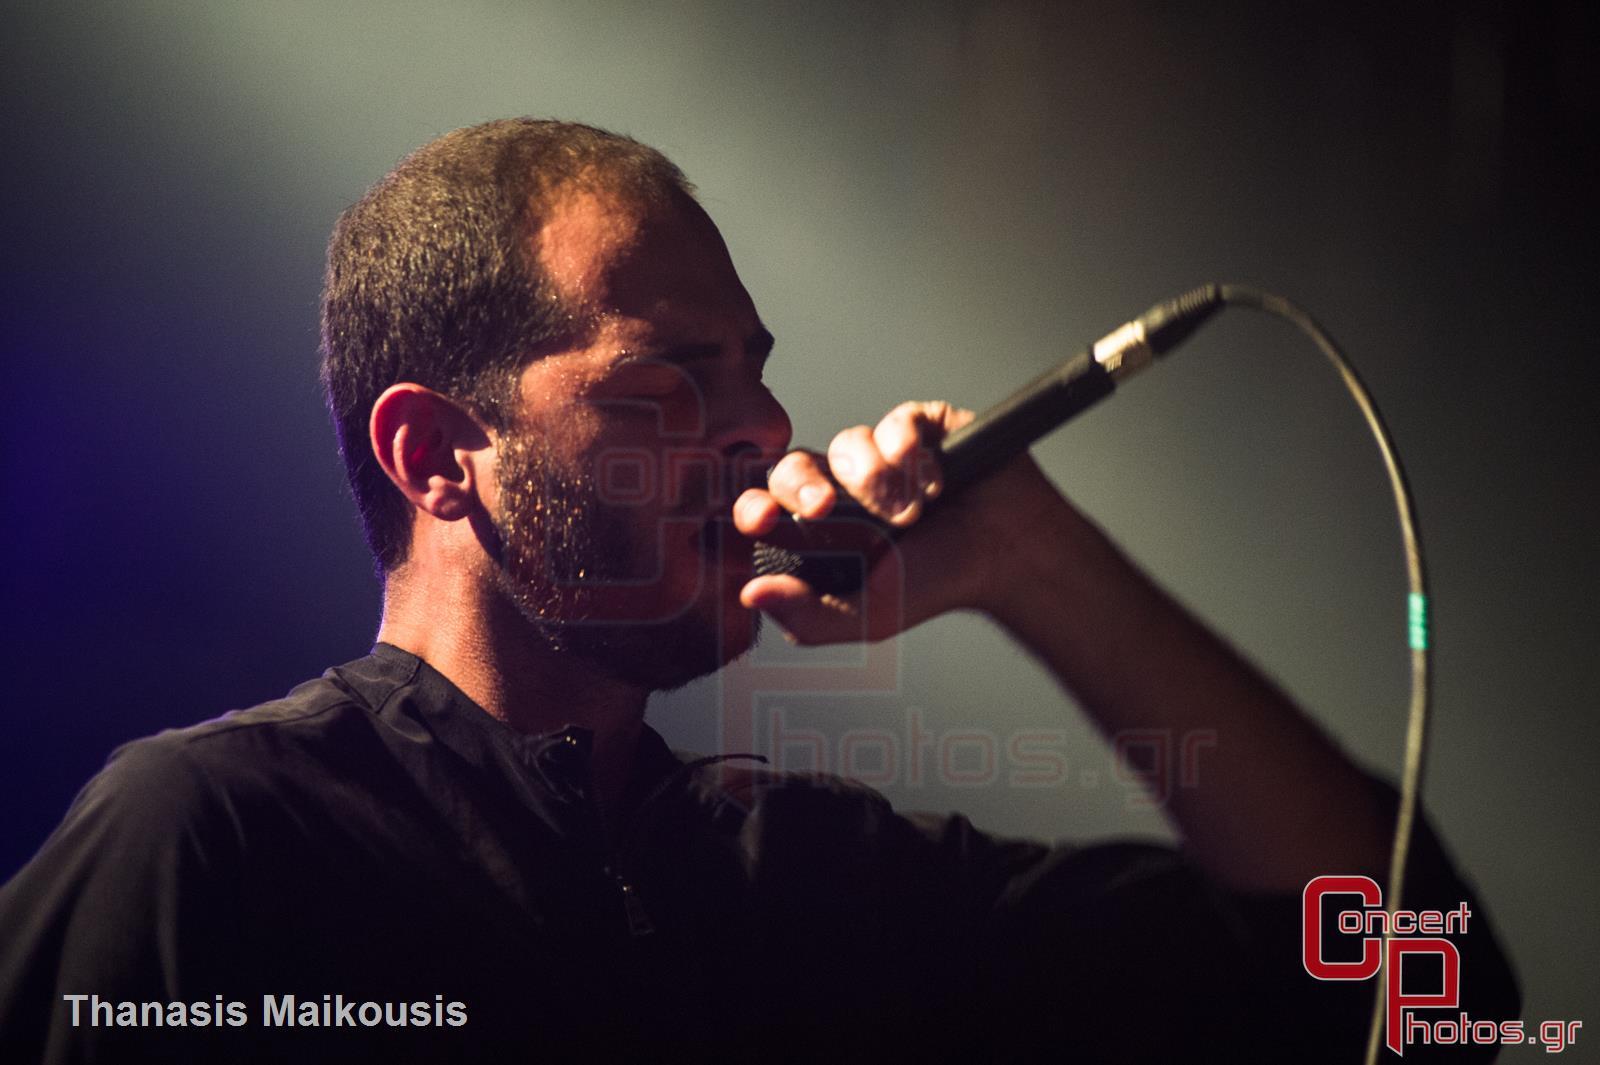 Gramatik-Gramatik Votanikos 2013 photographer: Thanasis Maikousis - ConcertPhotos-5331